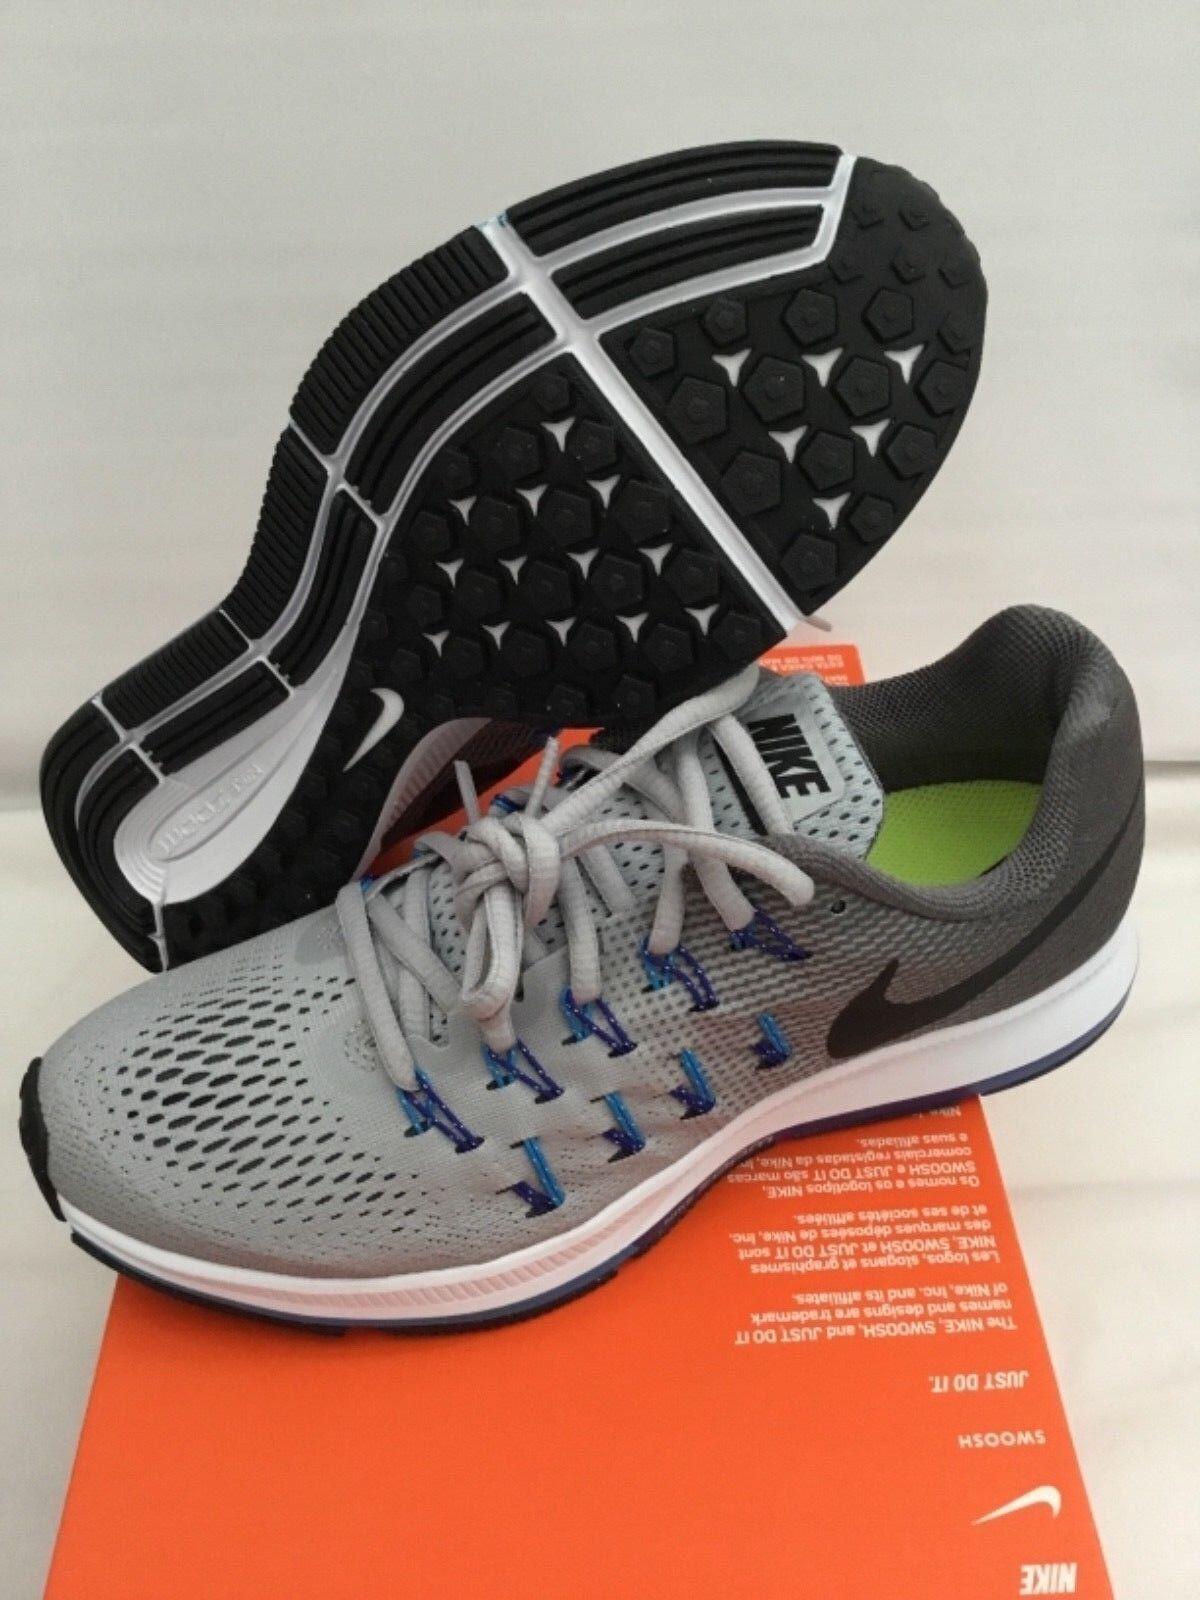 Nike Men's Air Zoom Pegasus 33 Grey Black Running Shoes Size 6.5(NO TOP LID)